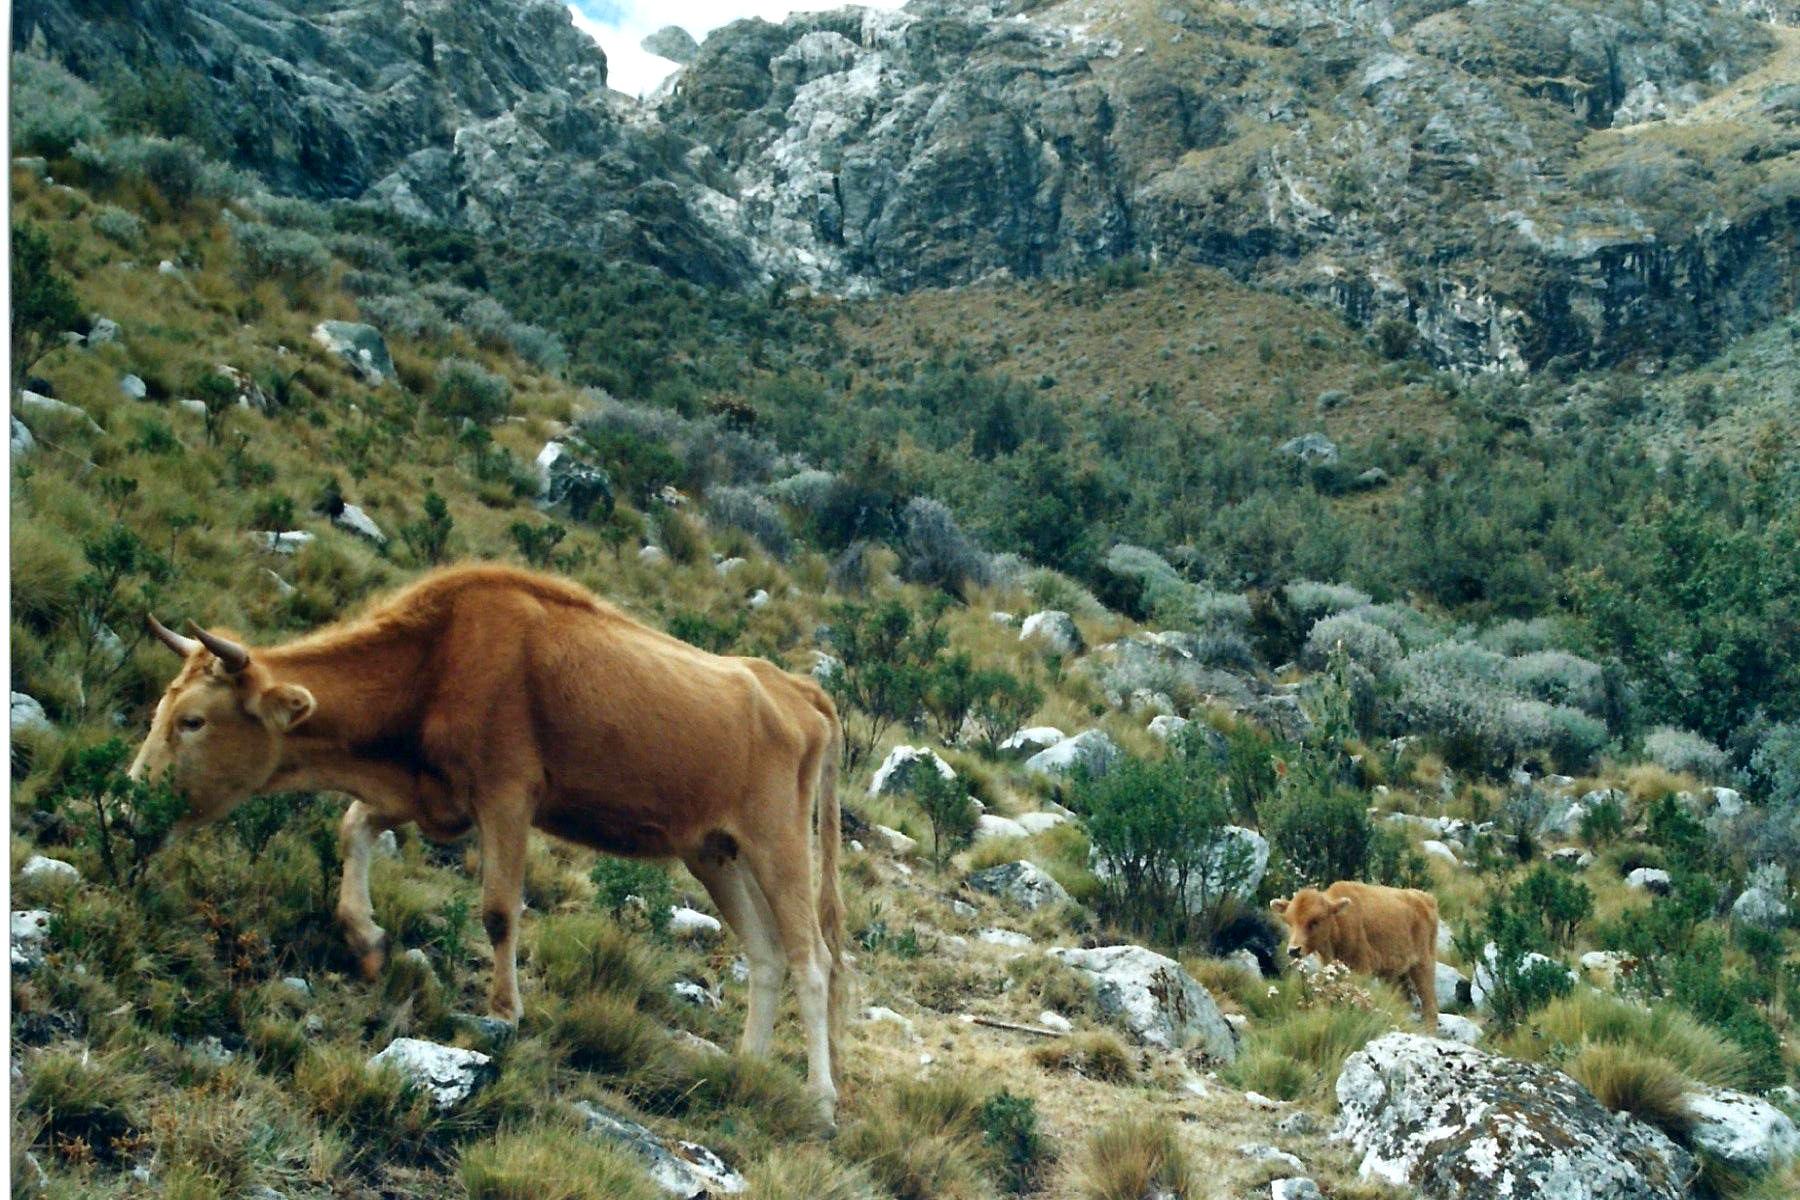 Auch wilde Kühe kreuzen unseren Weg.